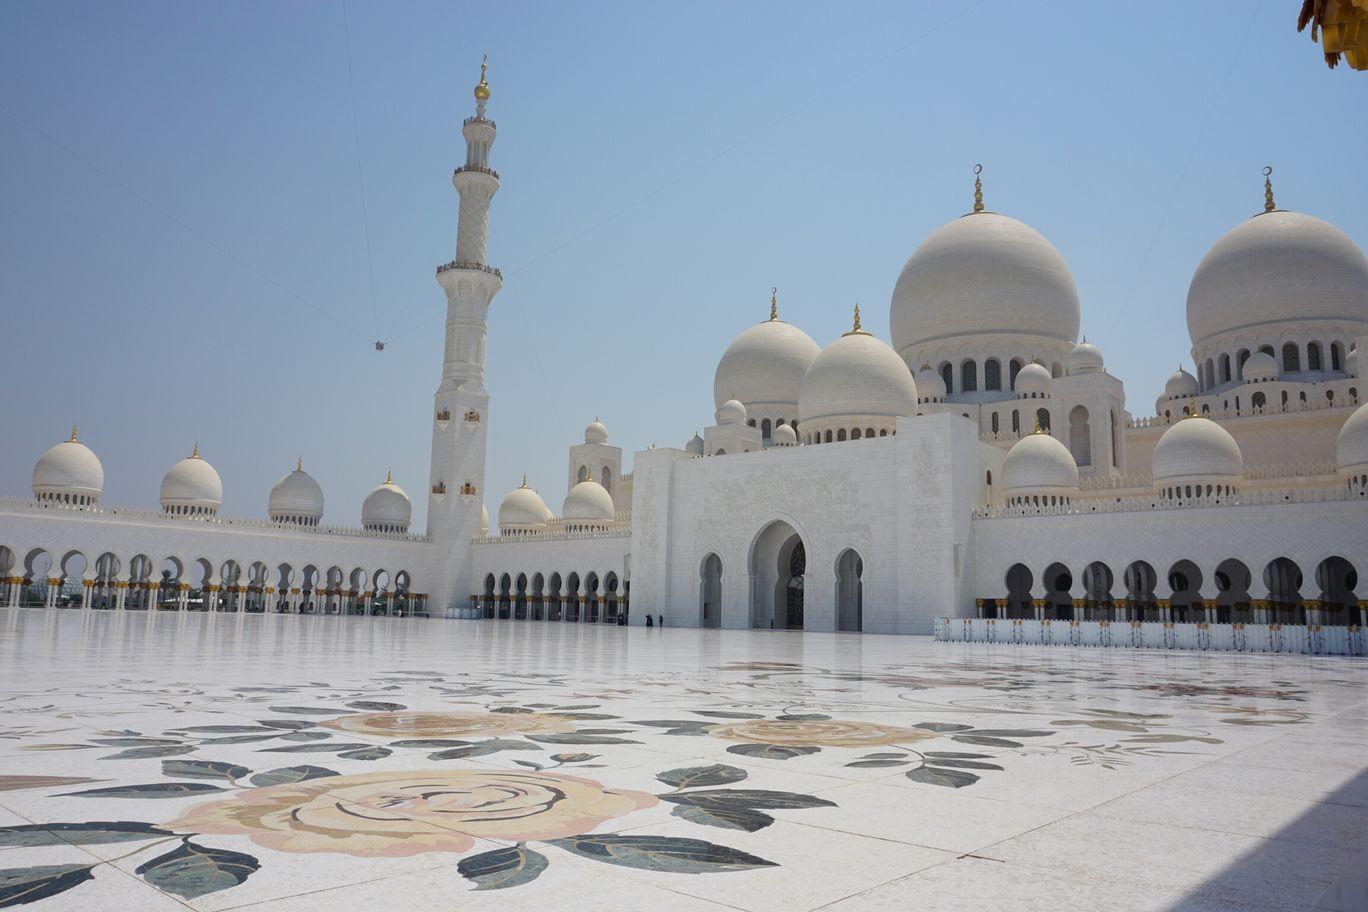 Photo of Abu Dhabi - United Arab Emirates By Chhavi Tiwari